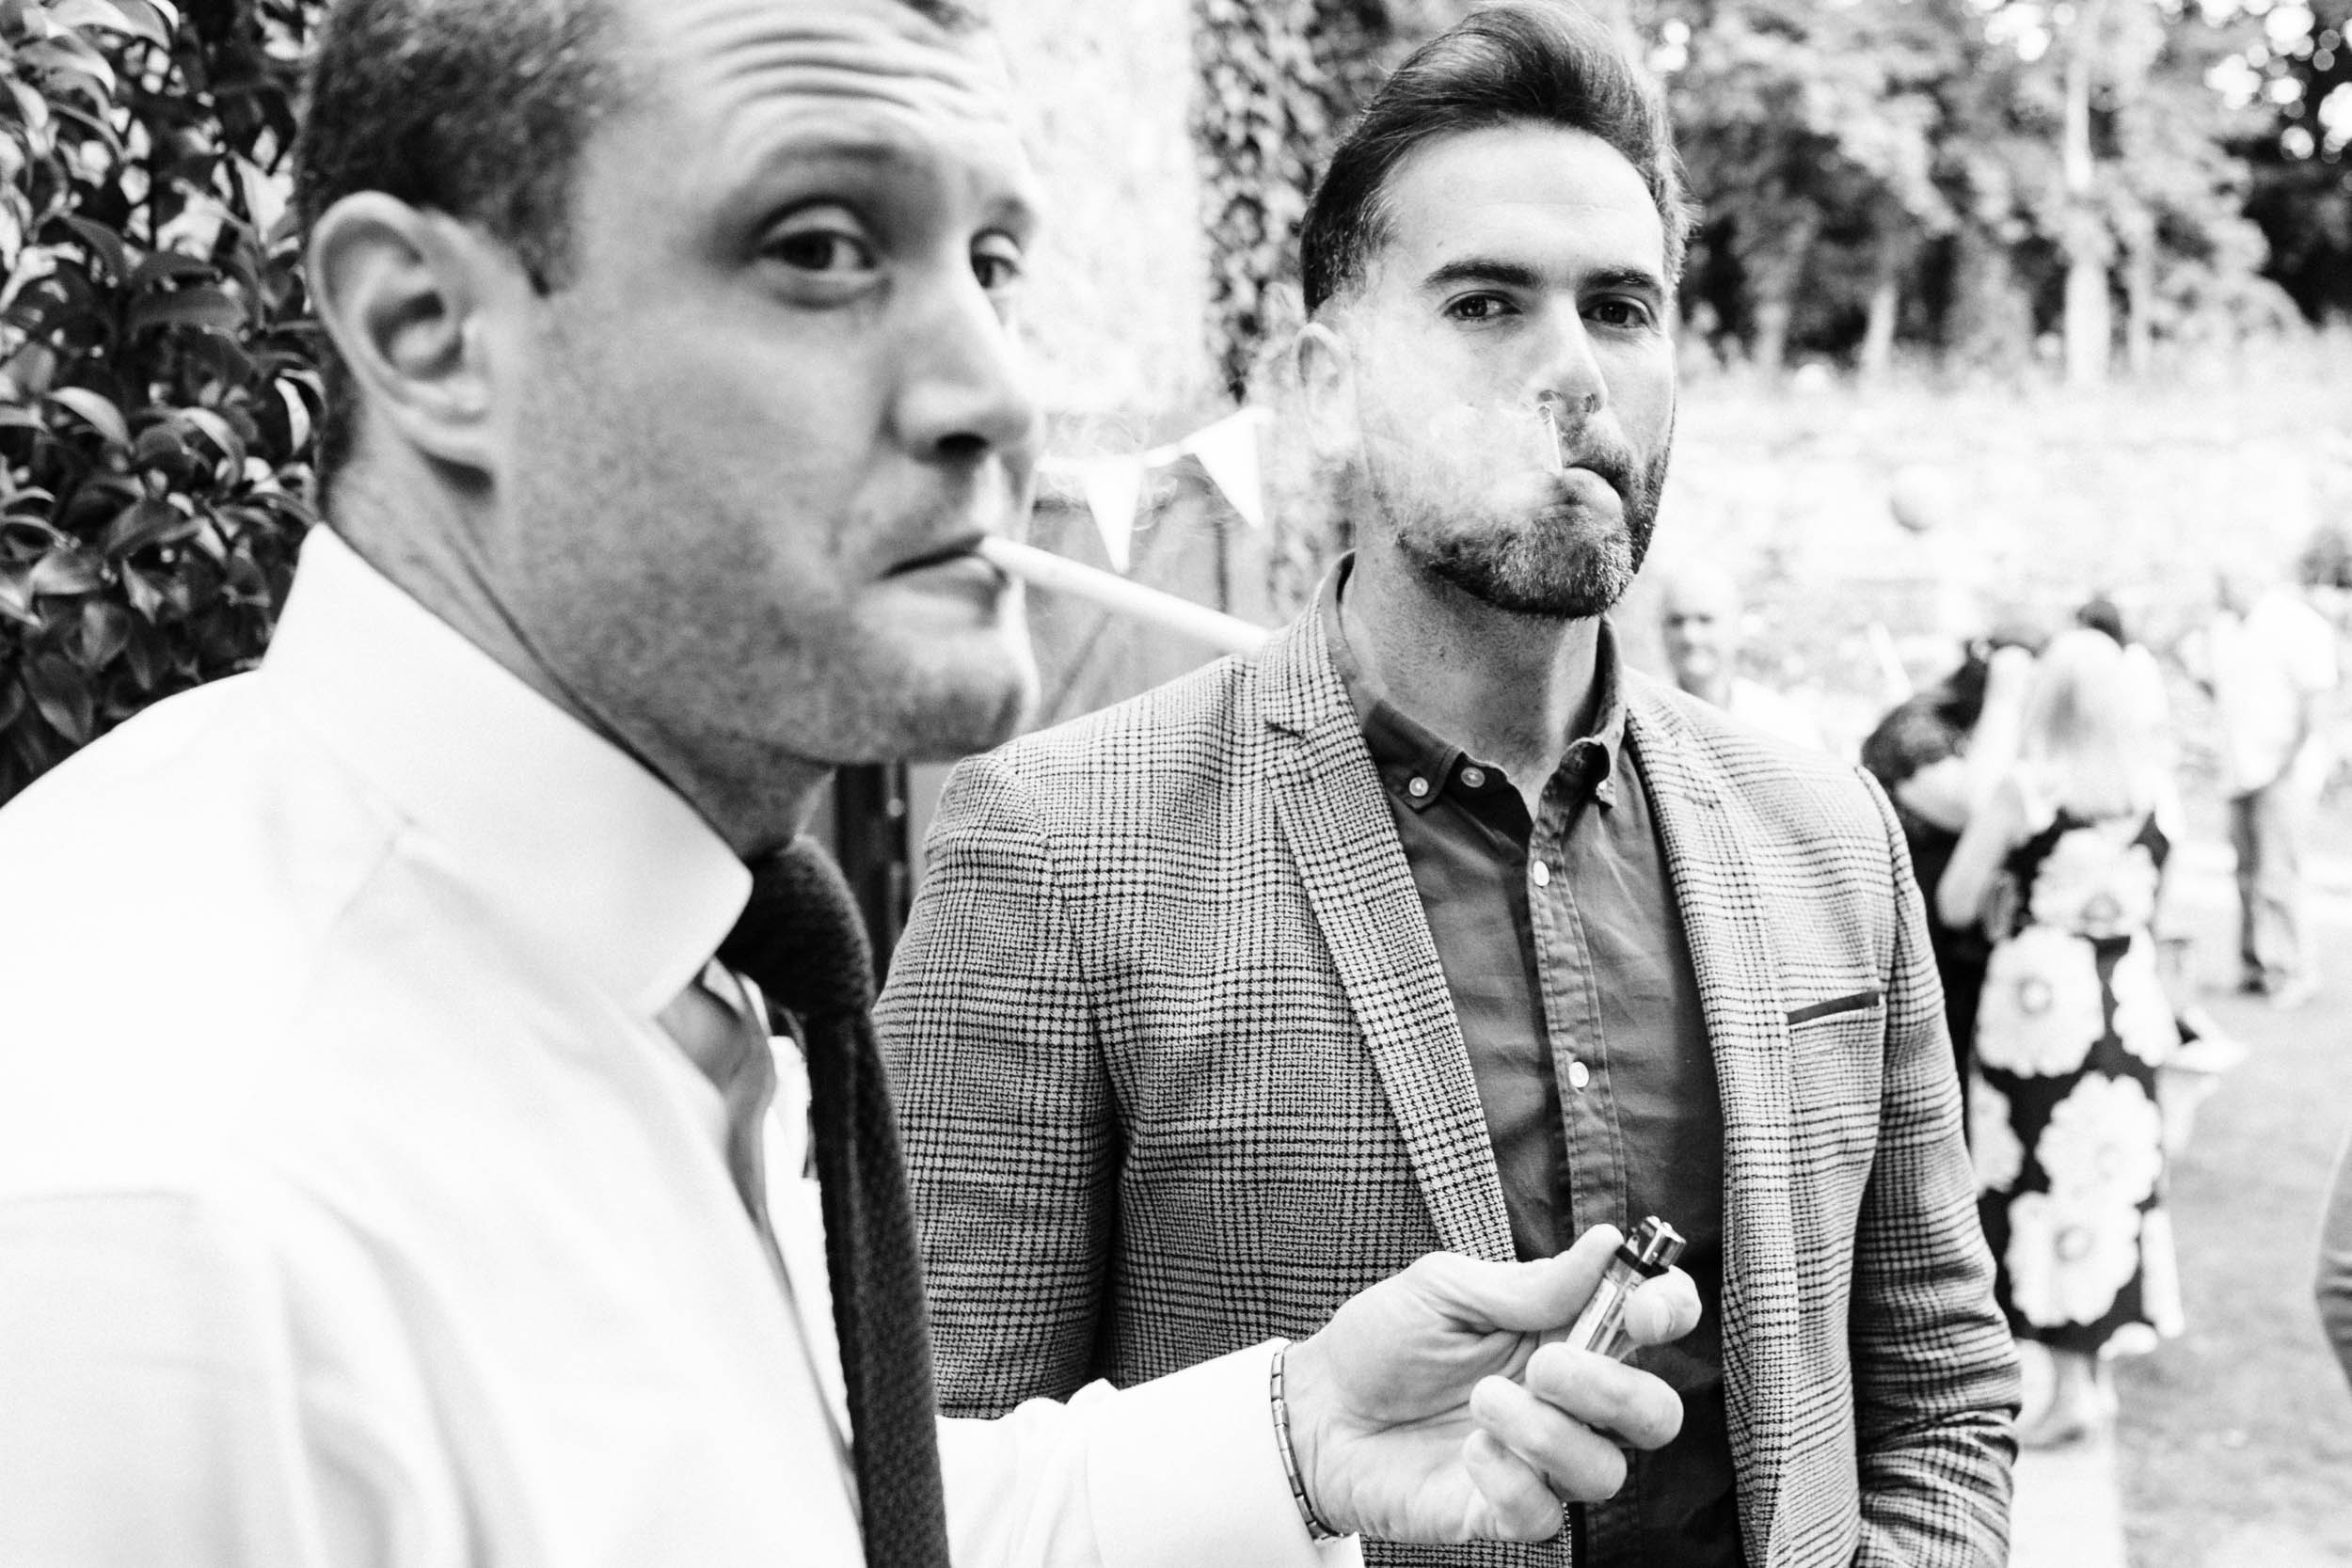 Alex_Sedgmond_Photography-SouthWalesWeddingPhotography-Wedding-Photographer-Cardiff-59.jpg